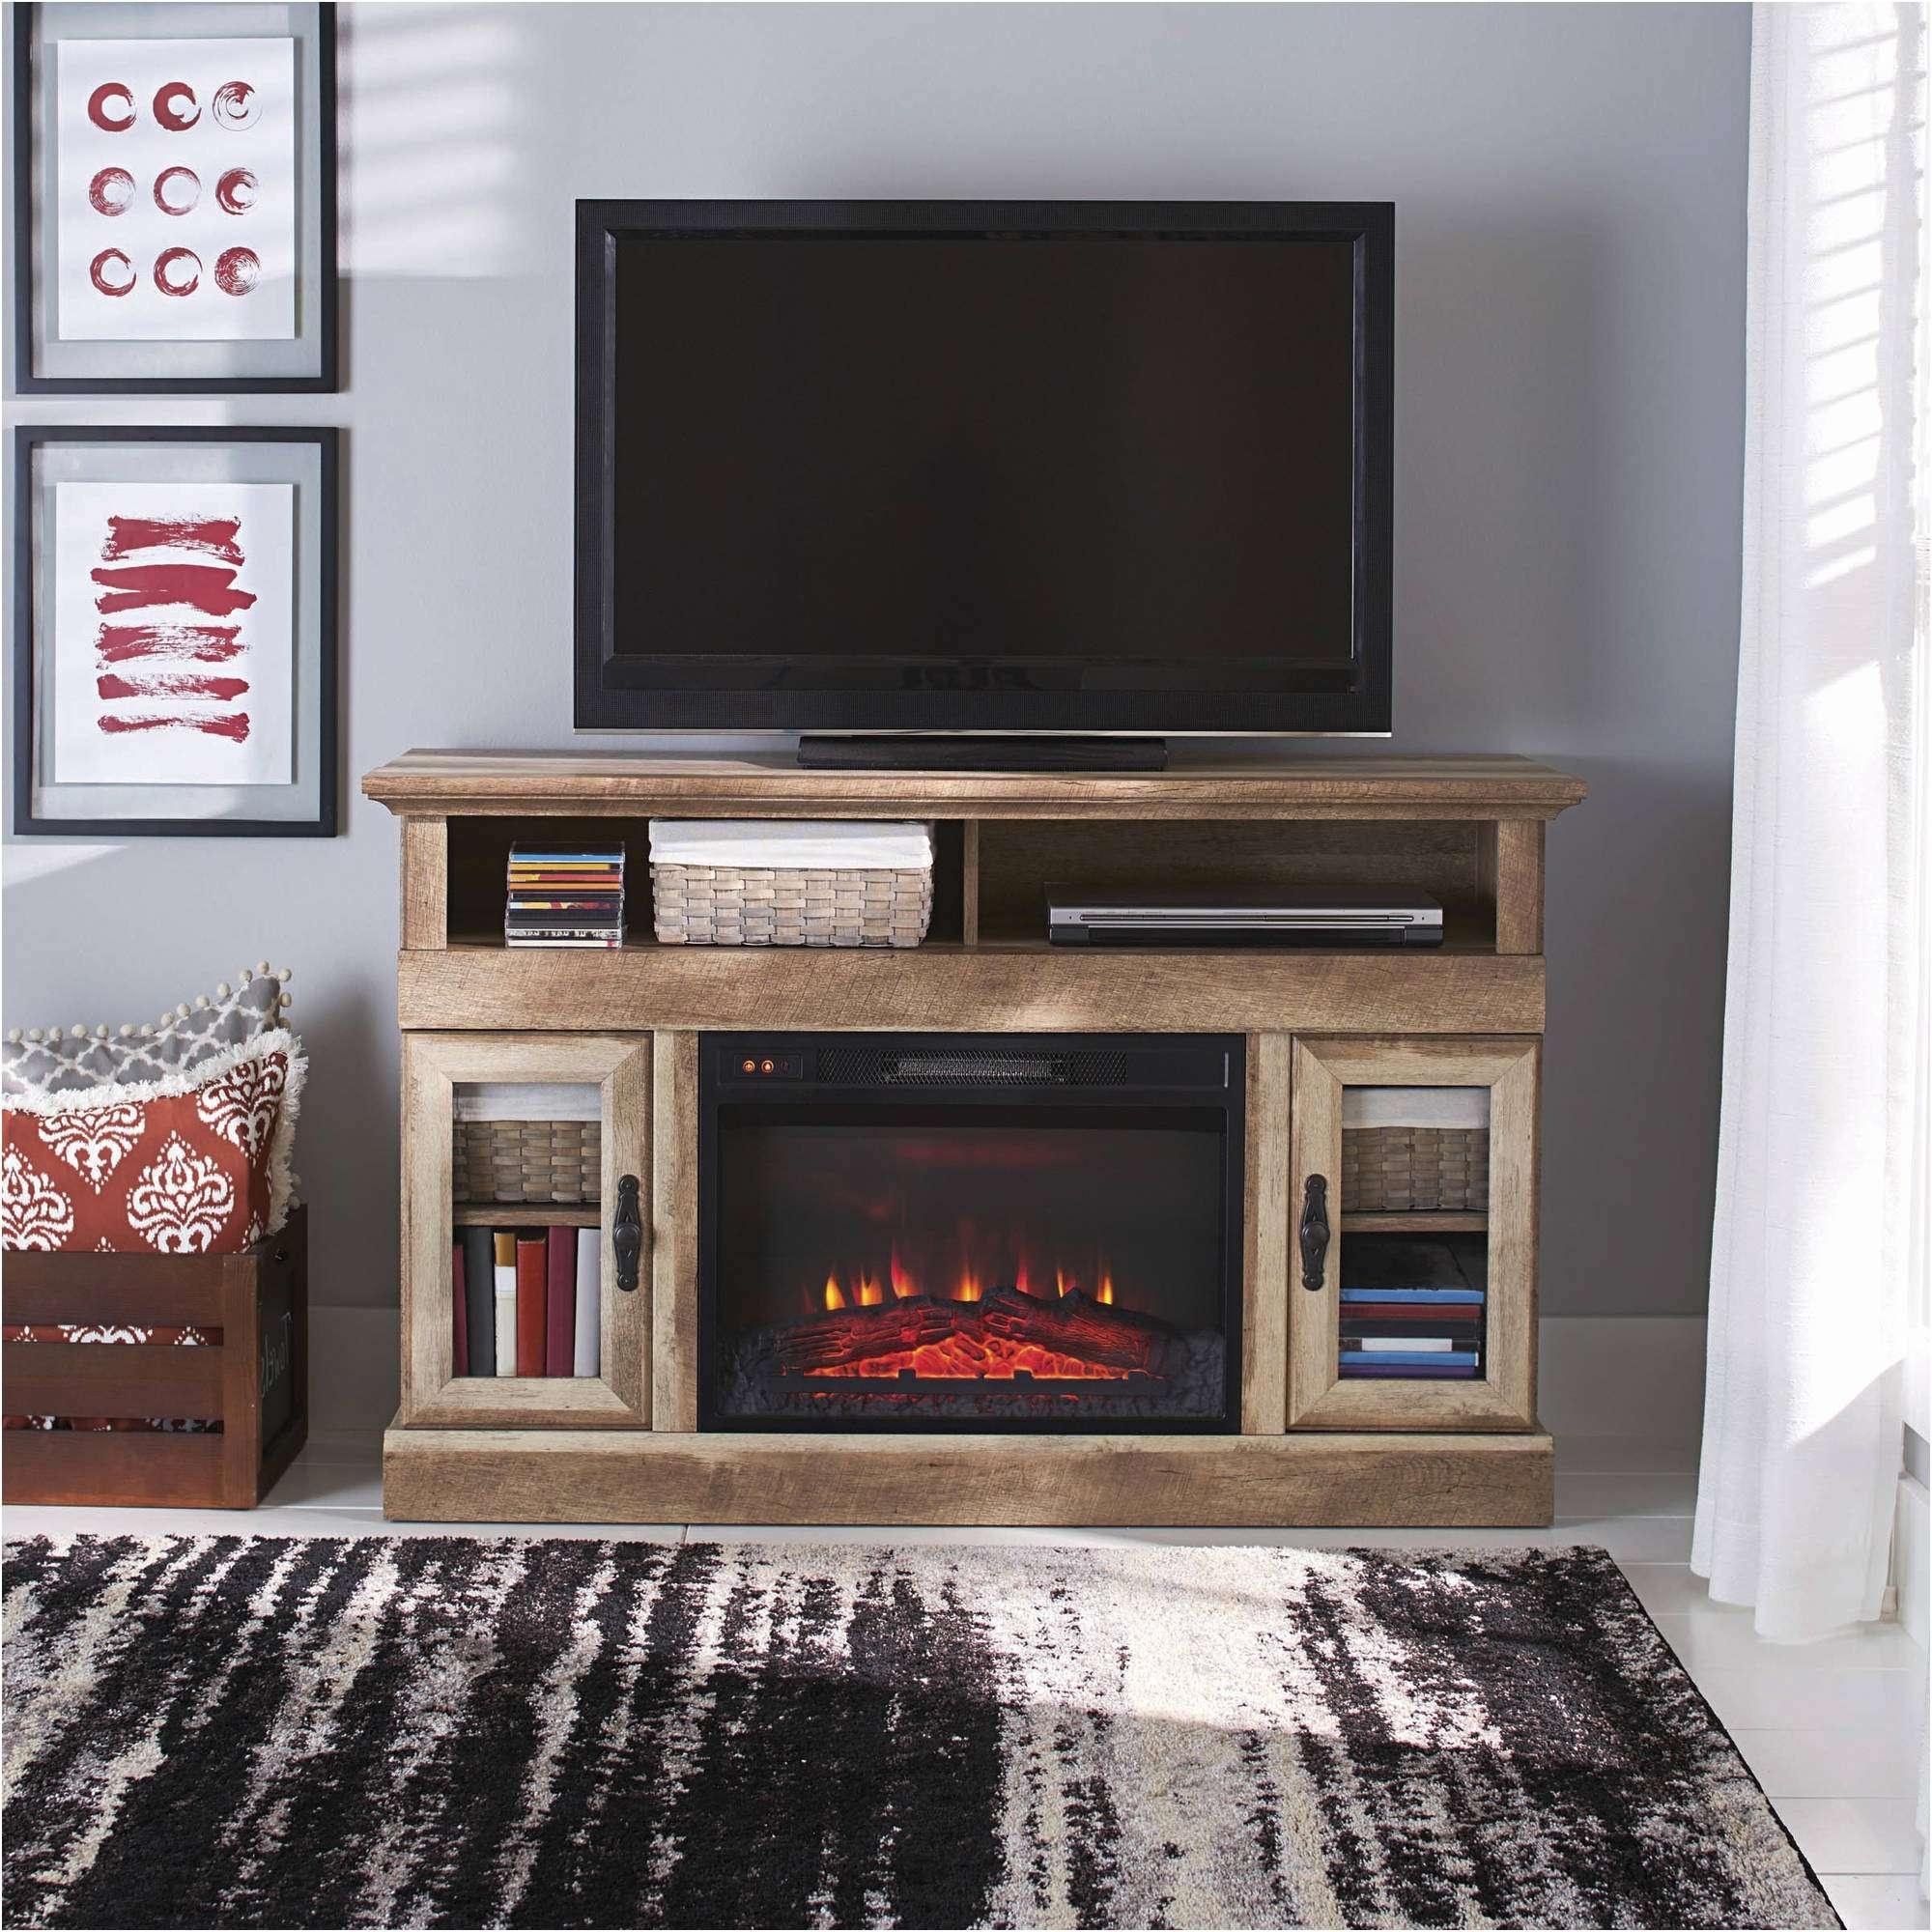 Living Room Tv Stands Luxury Tv Stands & Entertainment Centers Pertaining To Luxury Tv Stands (View 2 of 15)